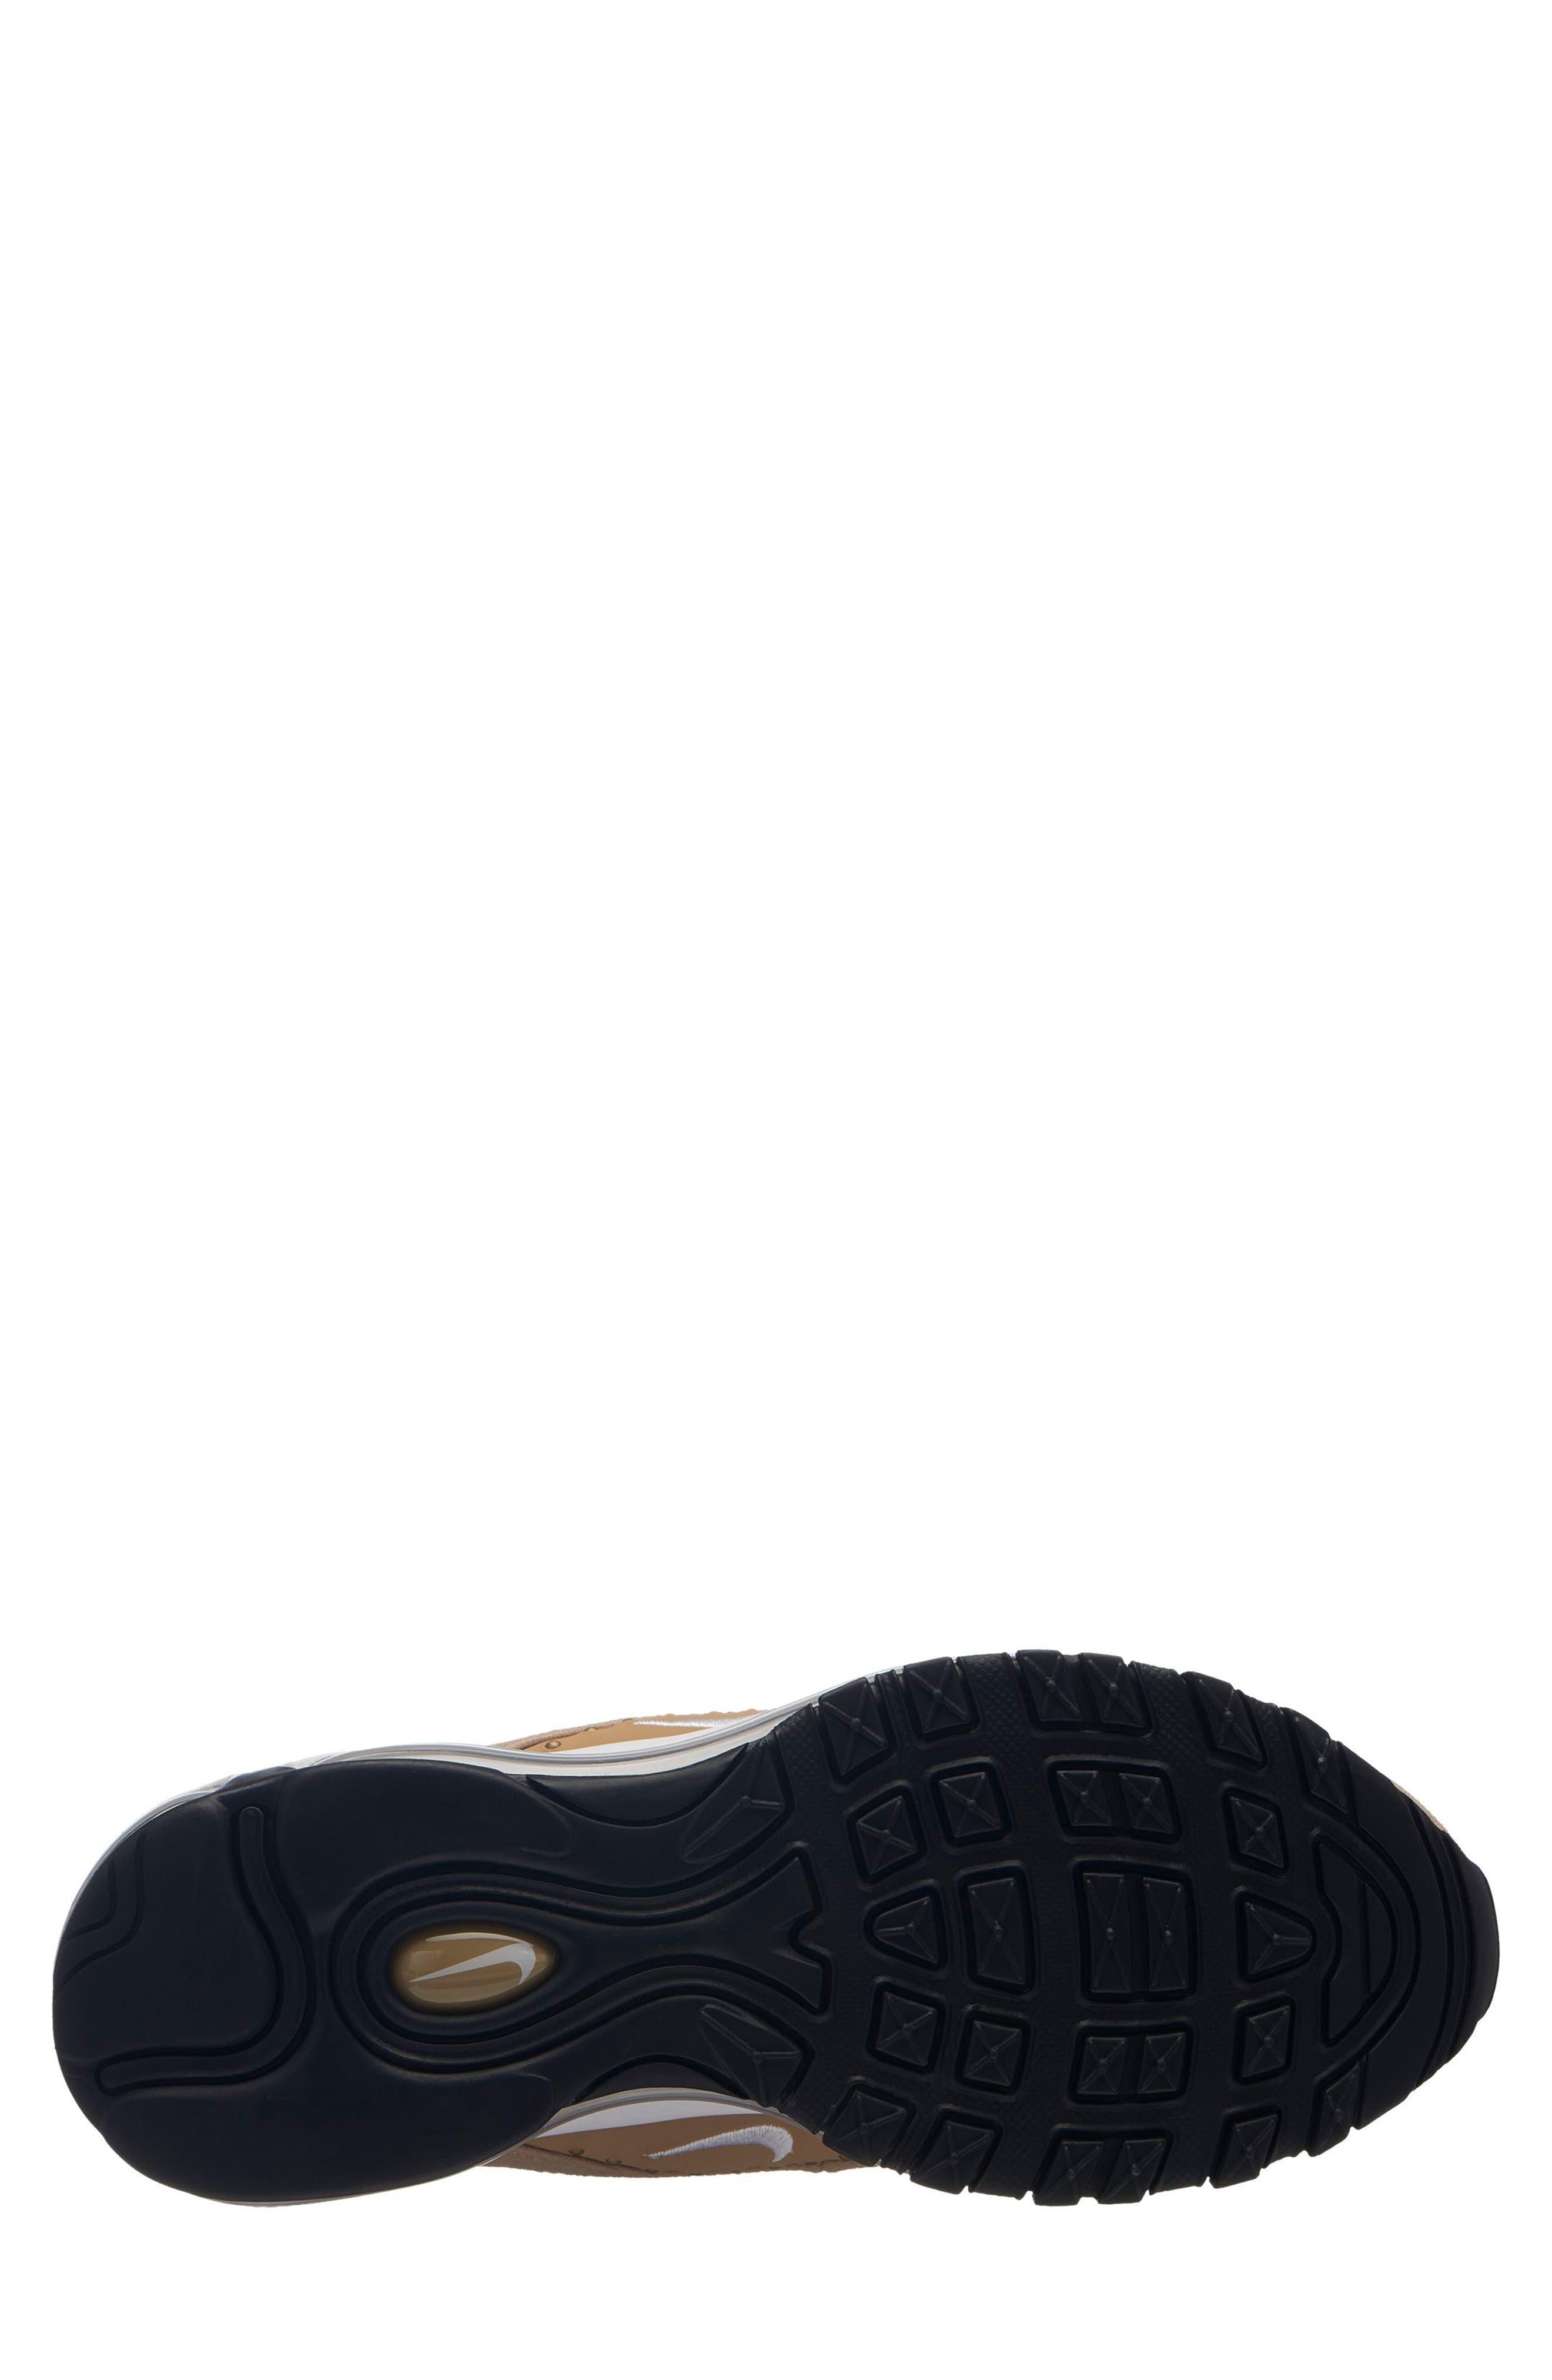 Air Max 97 SE Sneaker,                             Alternate thumbnail 2, color,                             BEIGE/ WHITE-BLACK